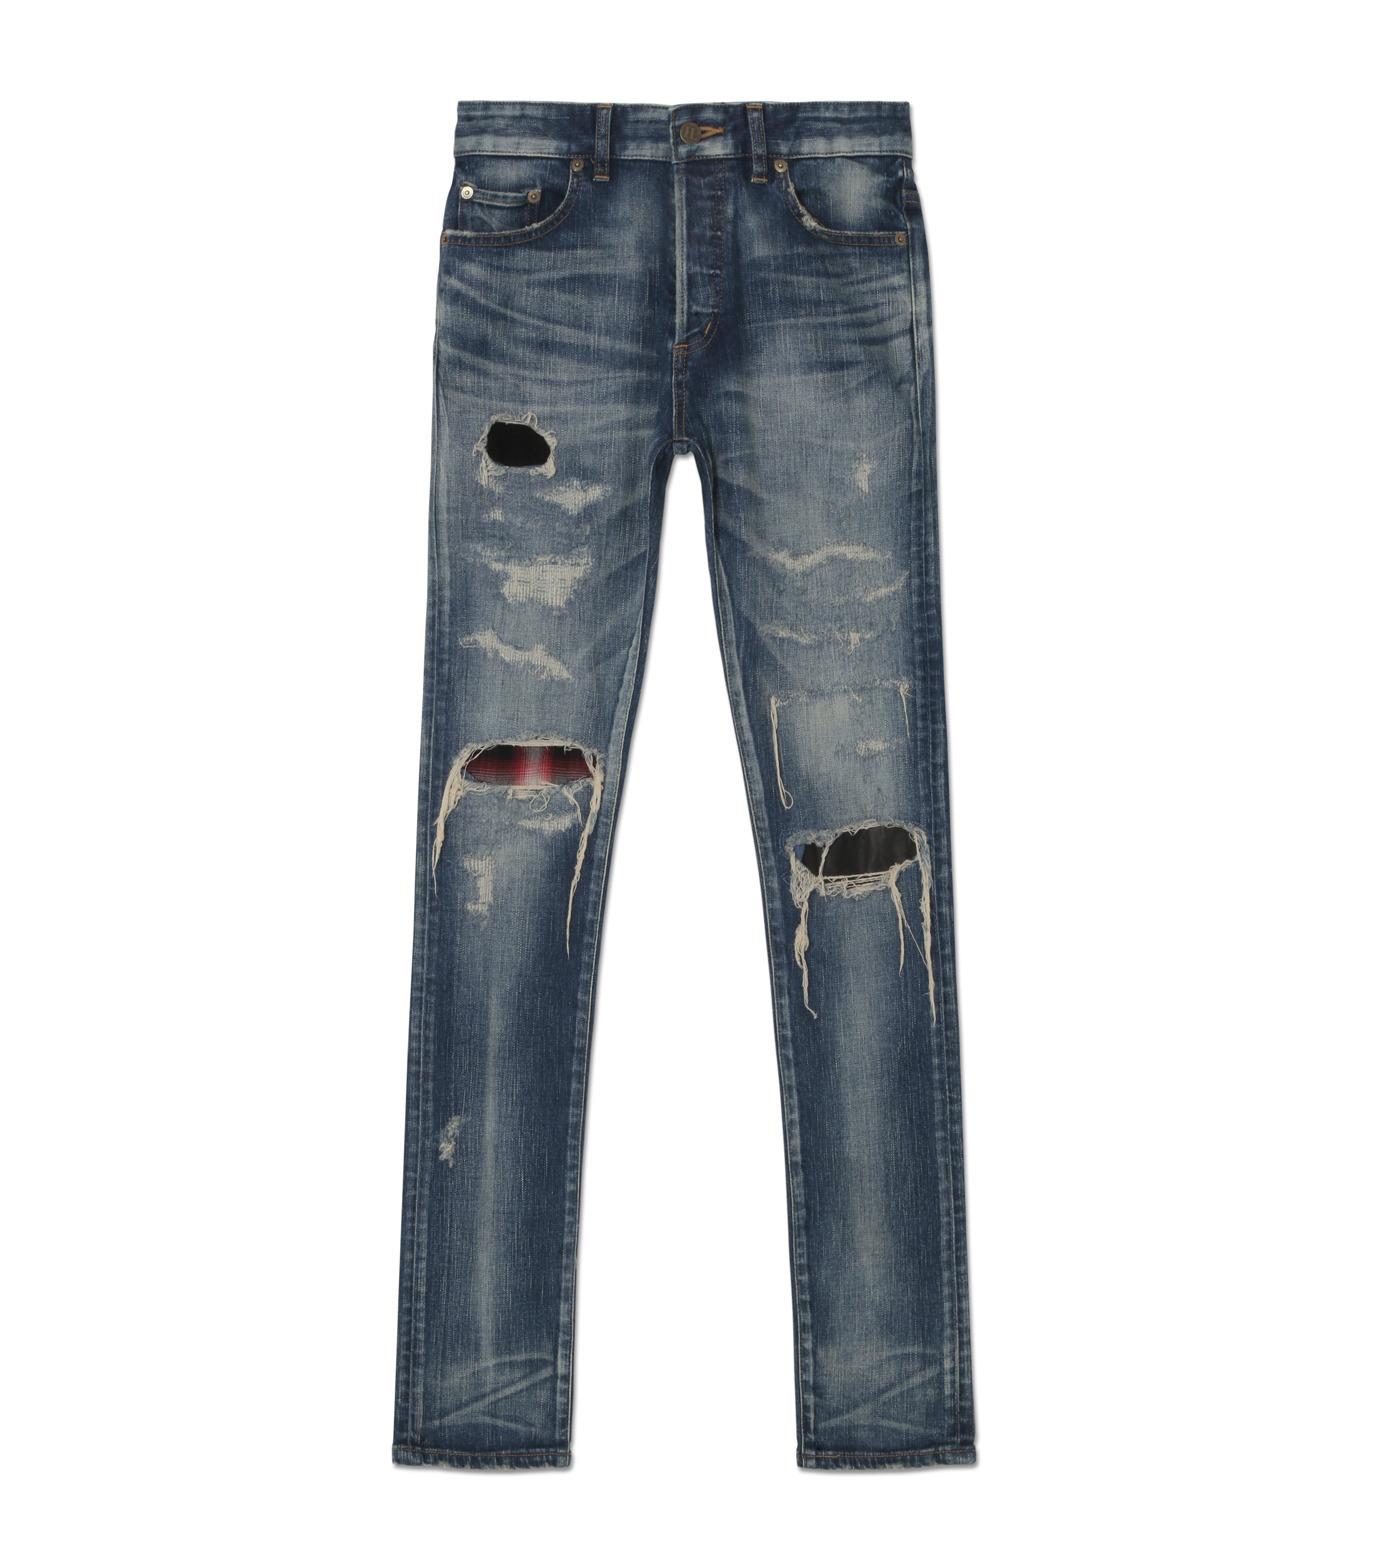 HL HEDDIE LOVU(エイチエル・エディールーヴ)のINDIGO DAMAGE5 SKIN SLIM-INDIGO(パンツ/pants)-18A98005-94 拡大詳細画像1